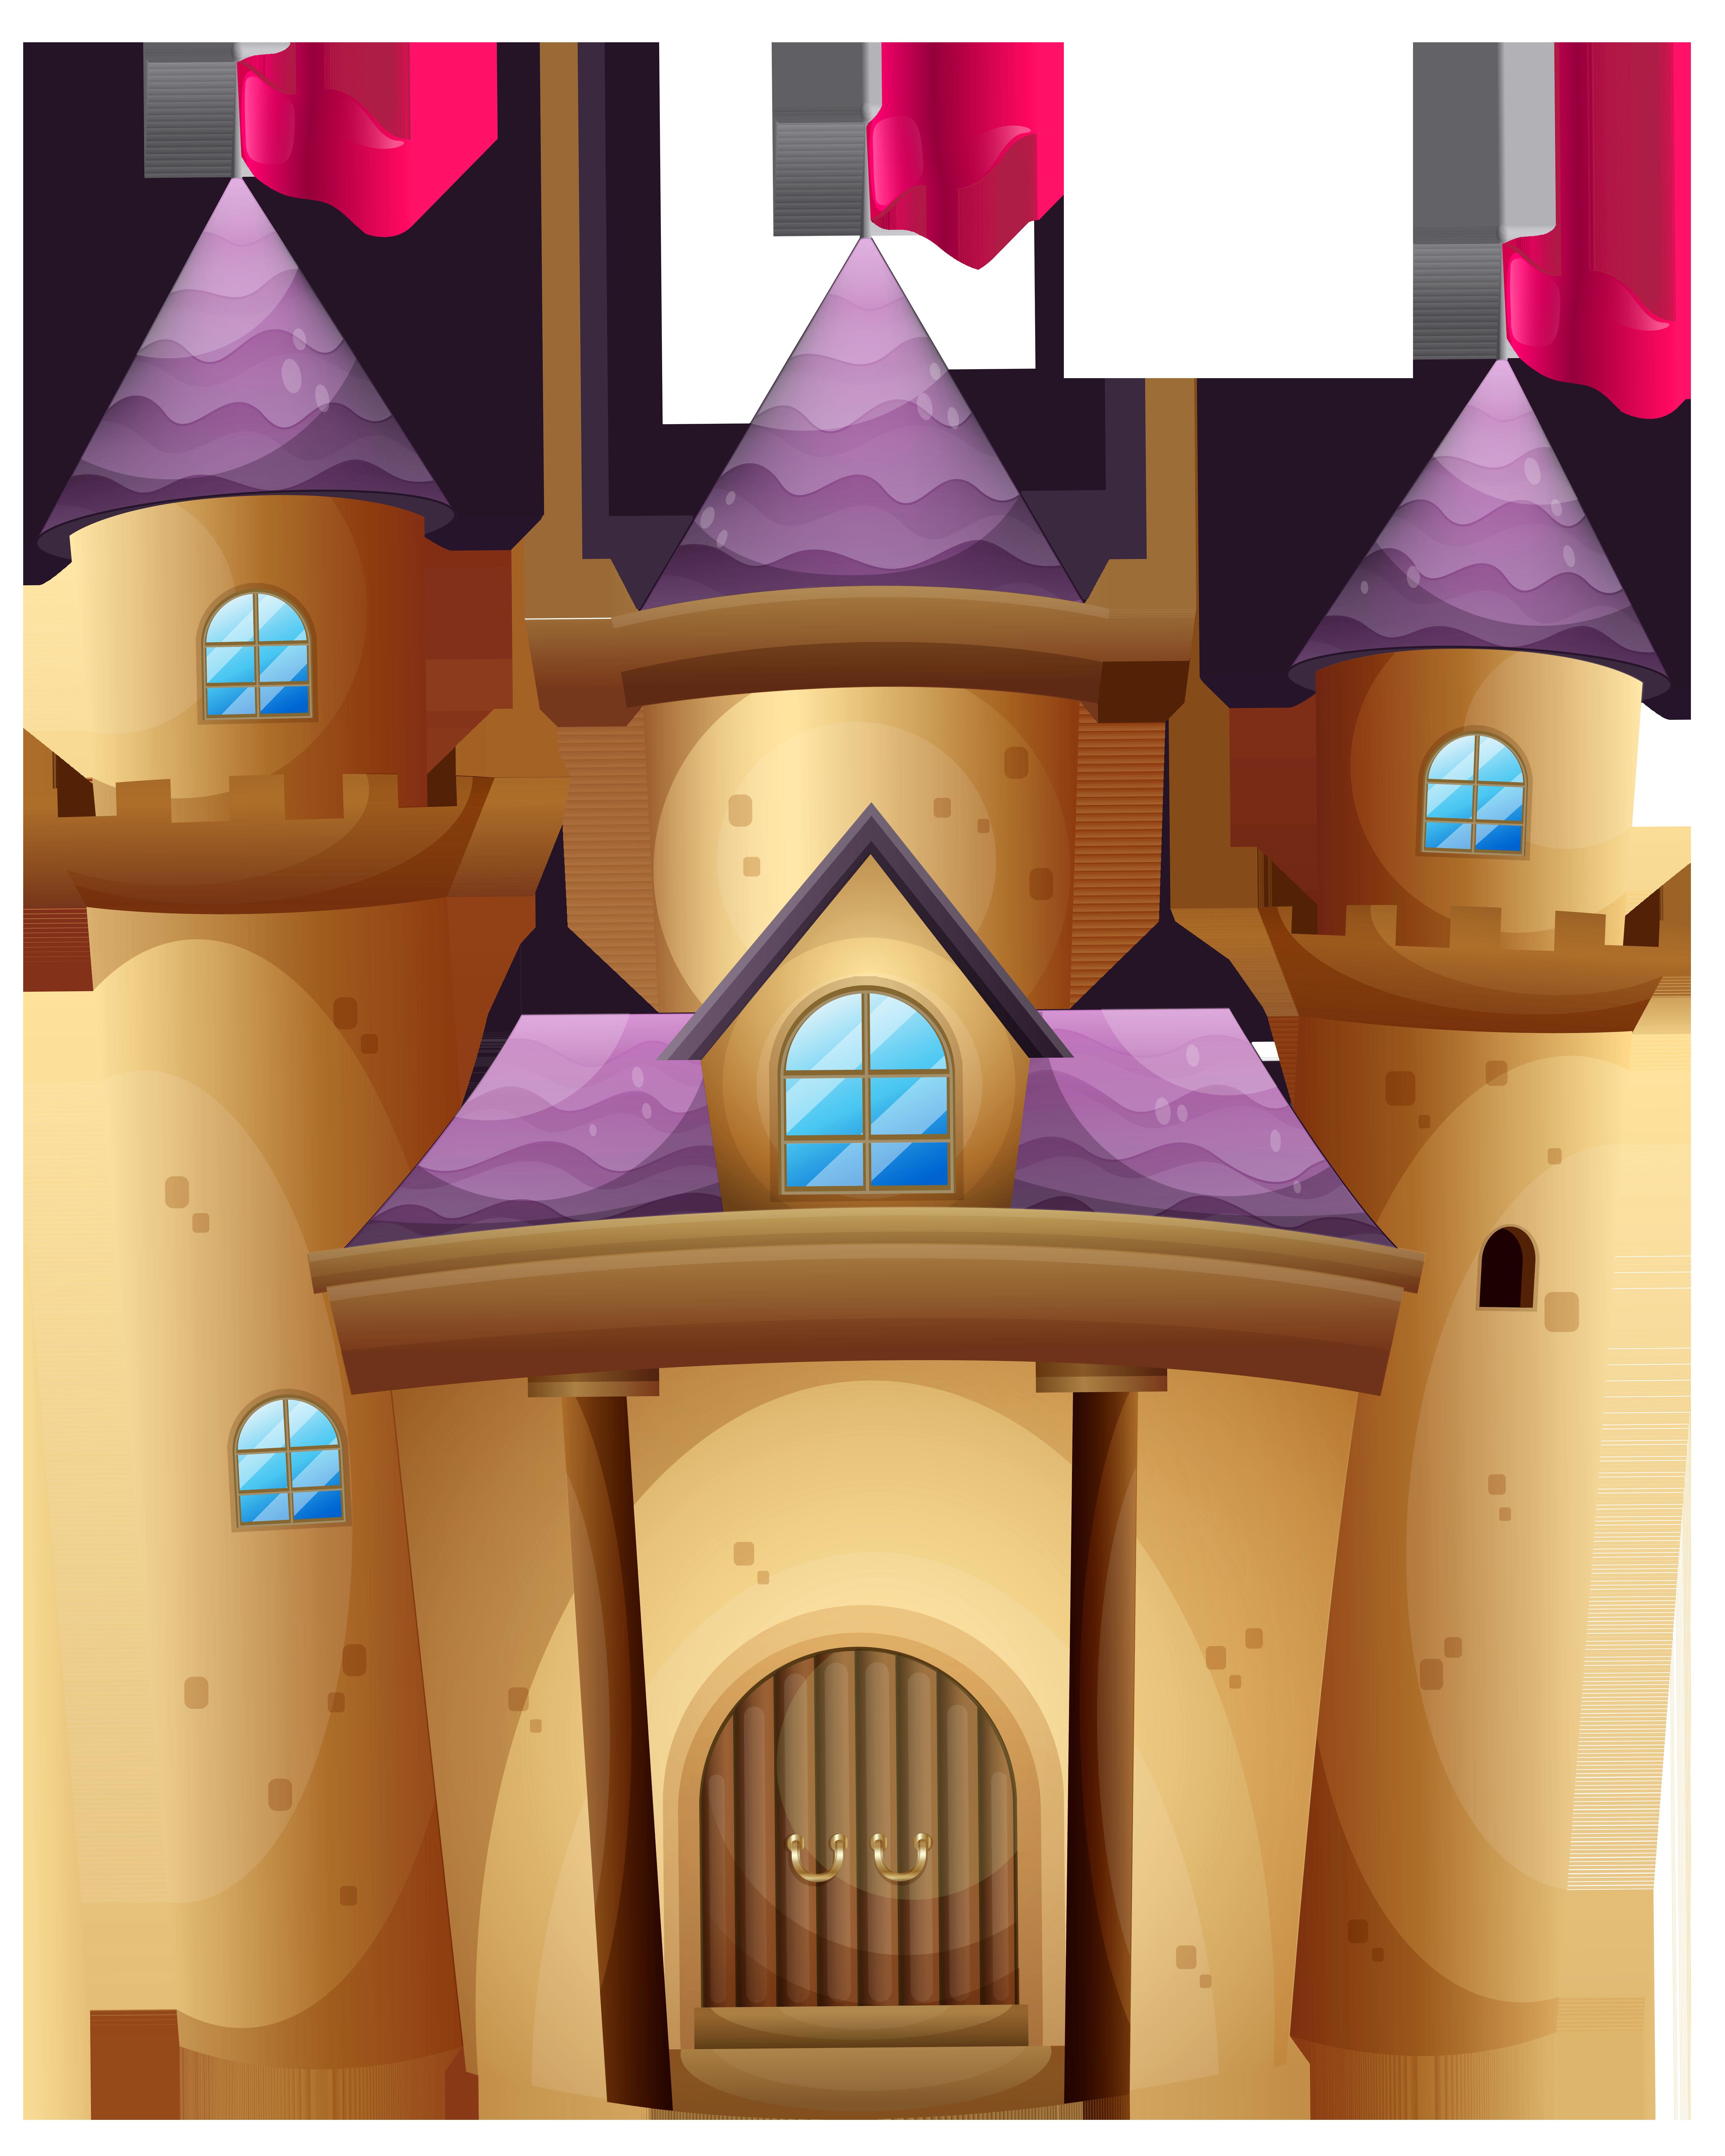 Staircase clipart castle. Png clip art image